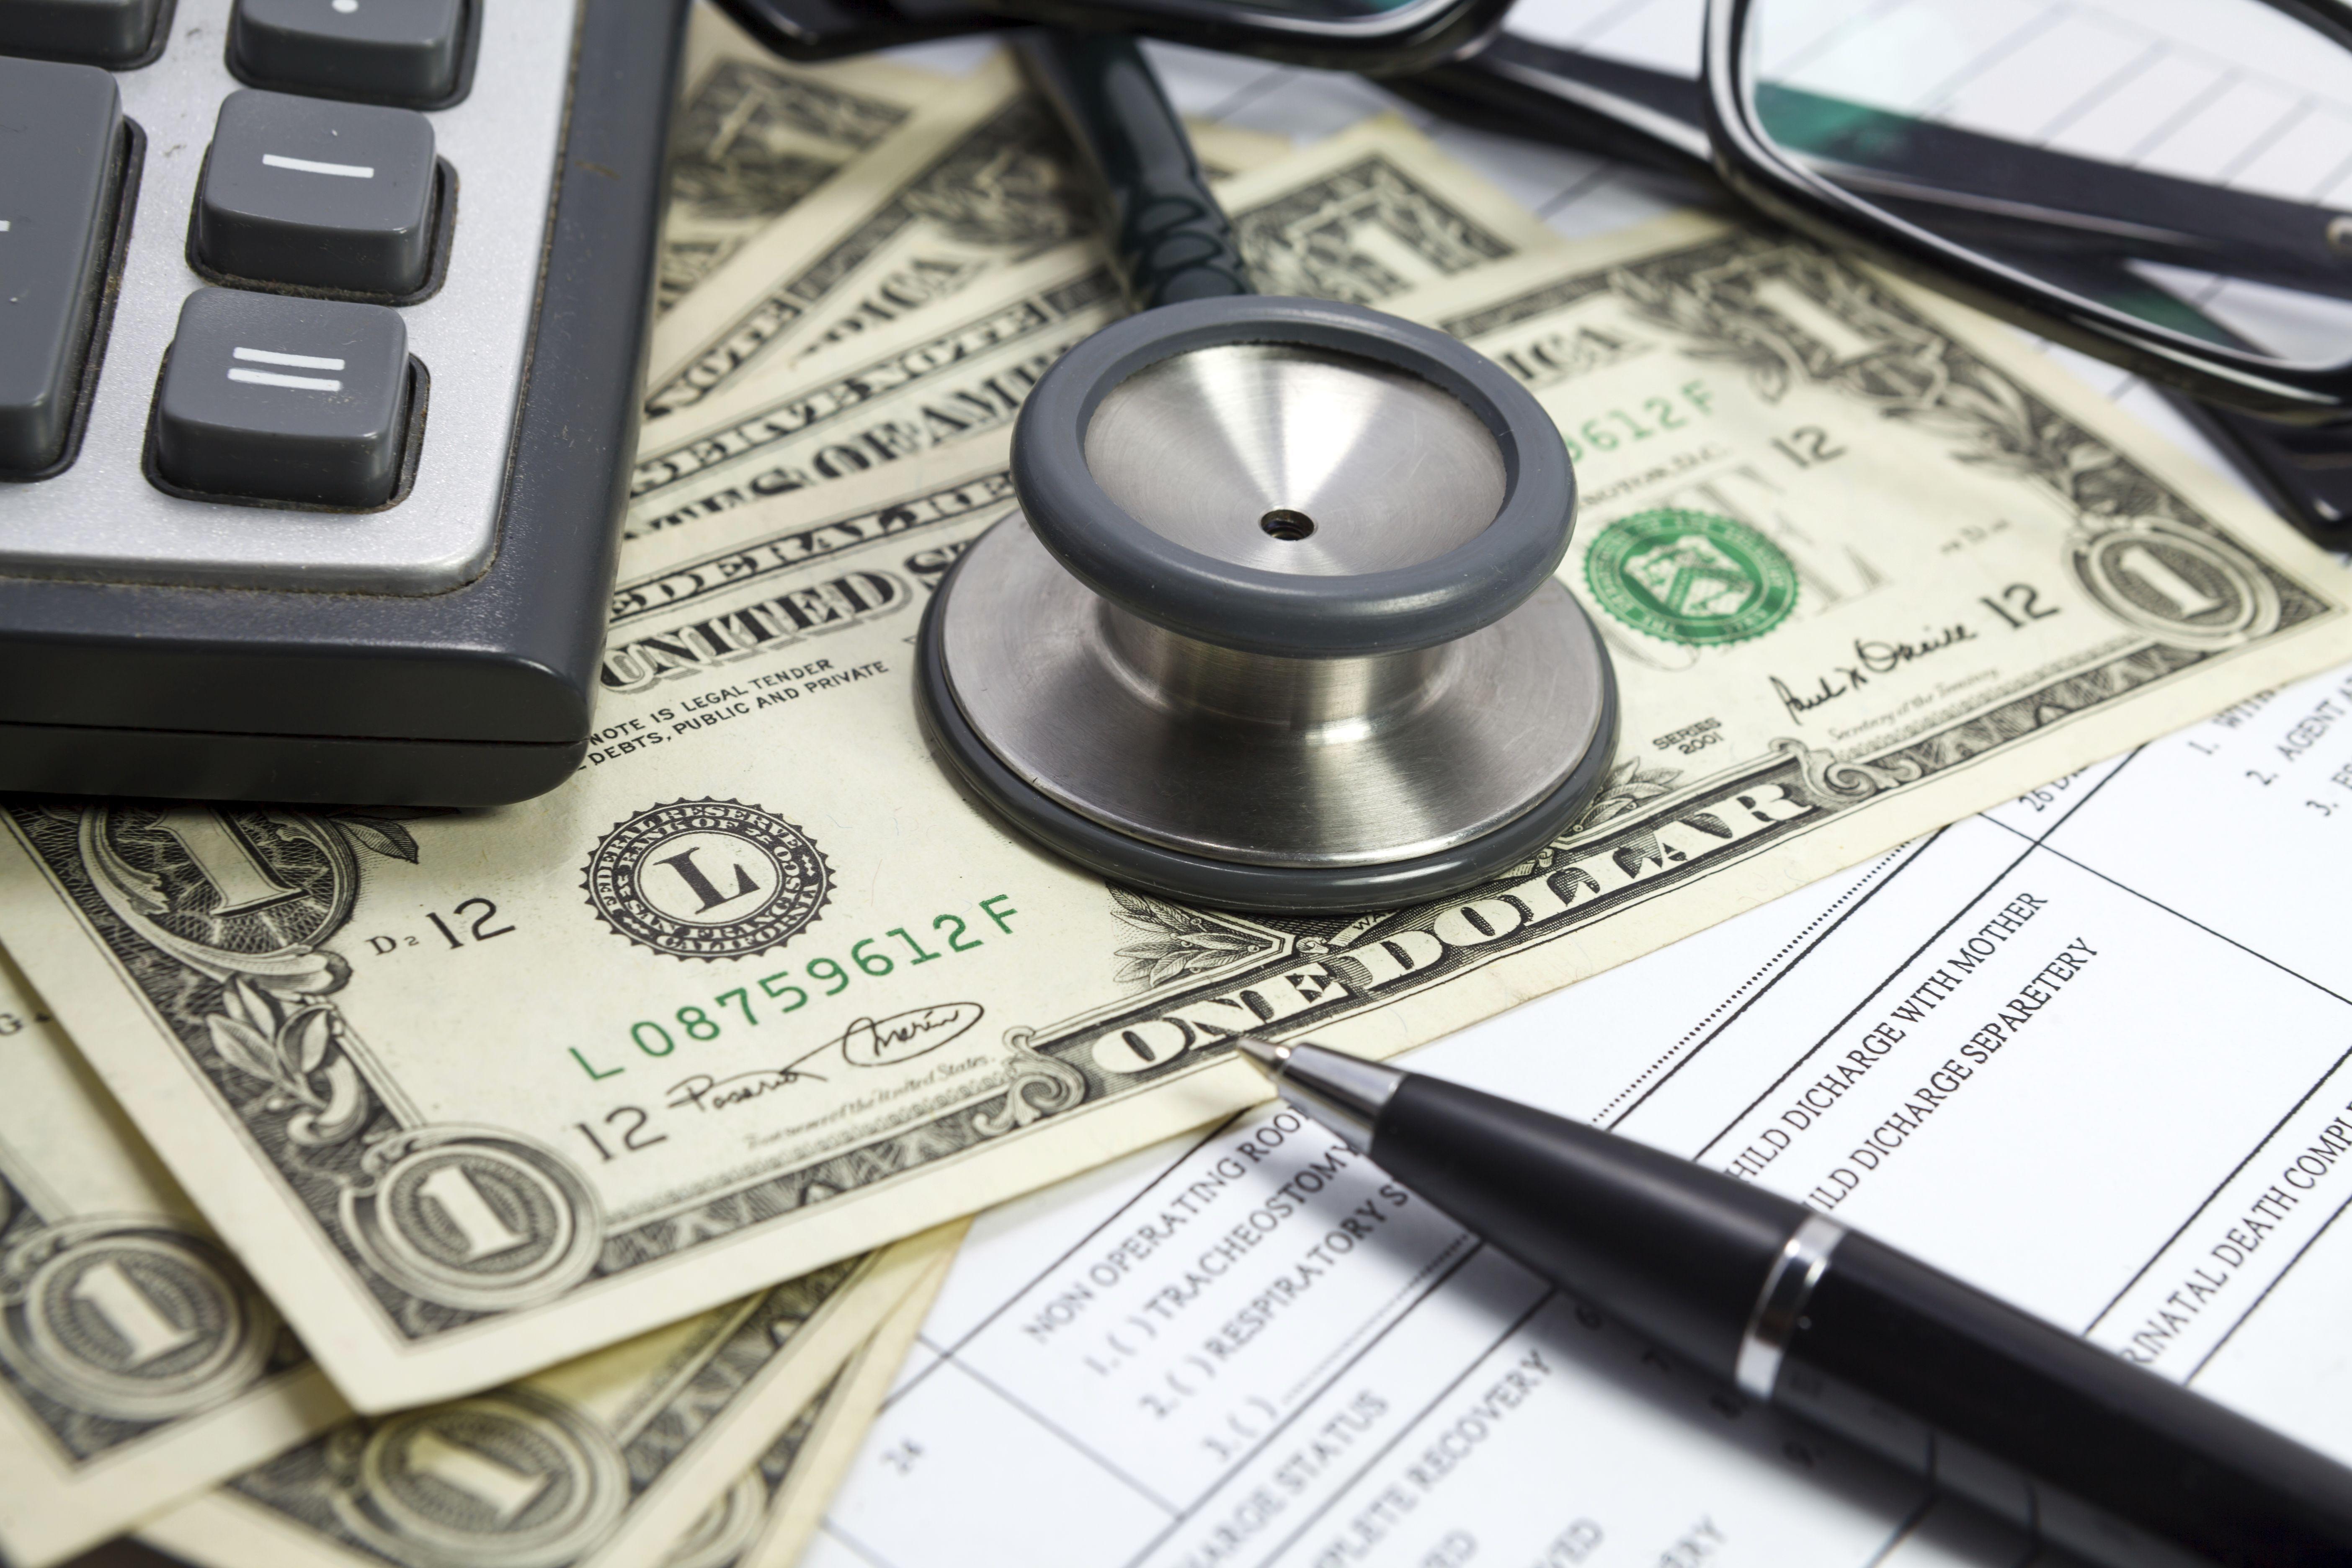 Don T Miss These Hidden Benefits Of Open Enrollment Health